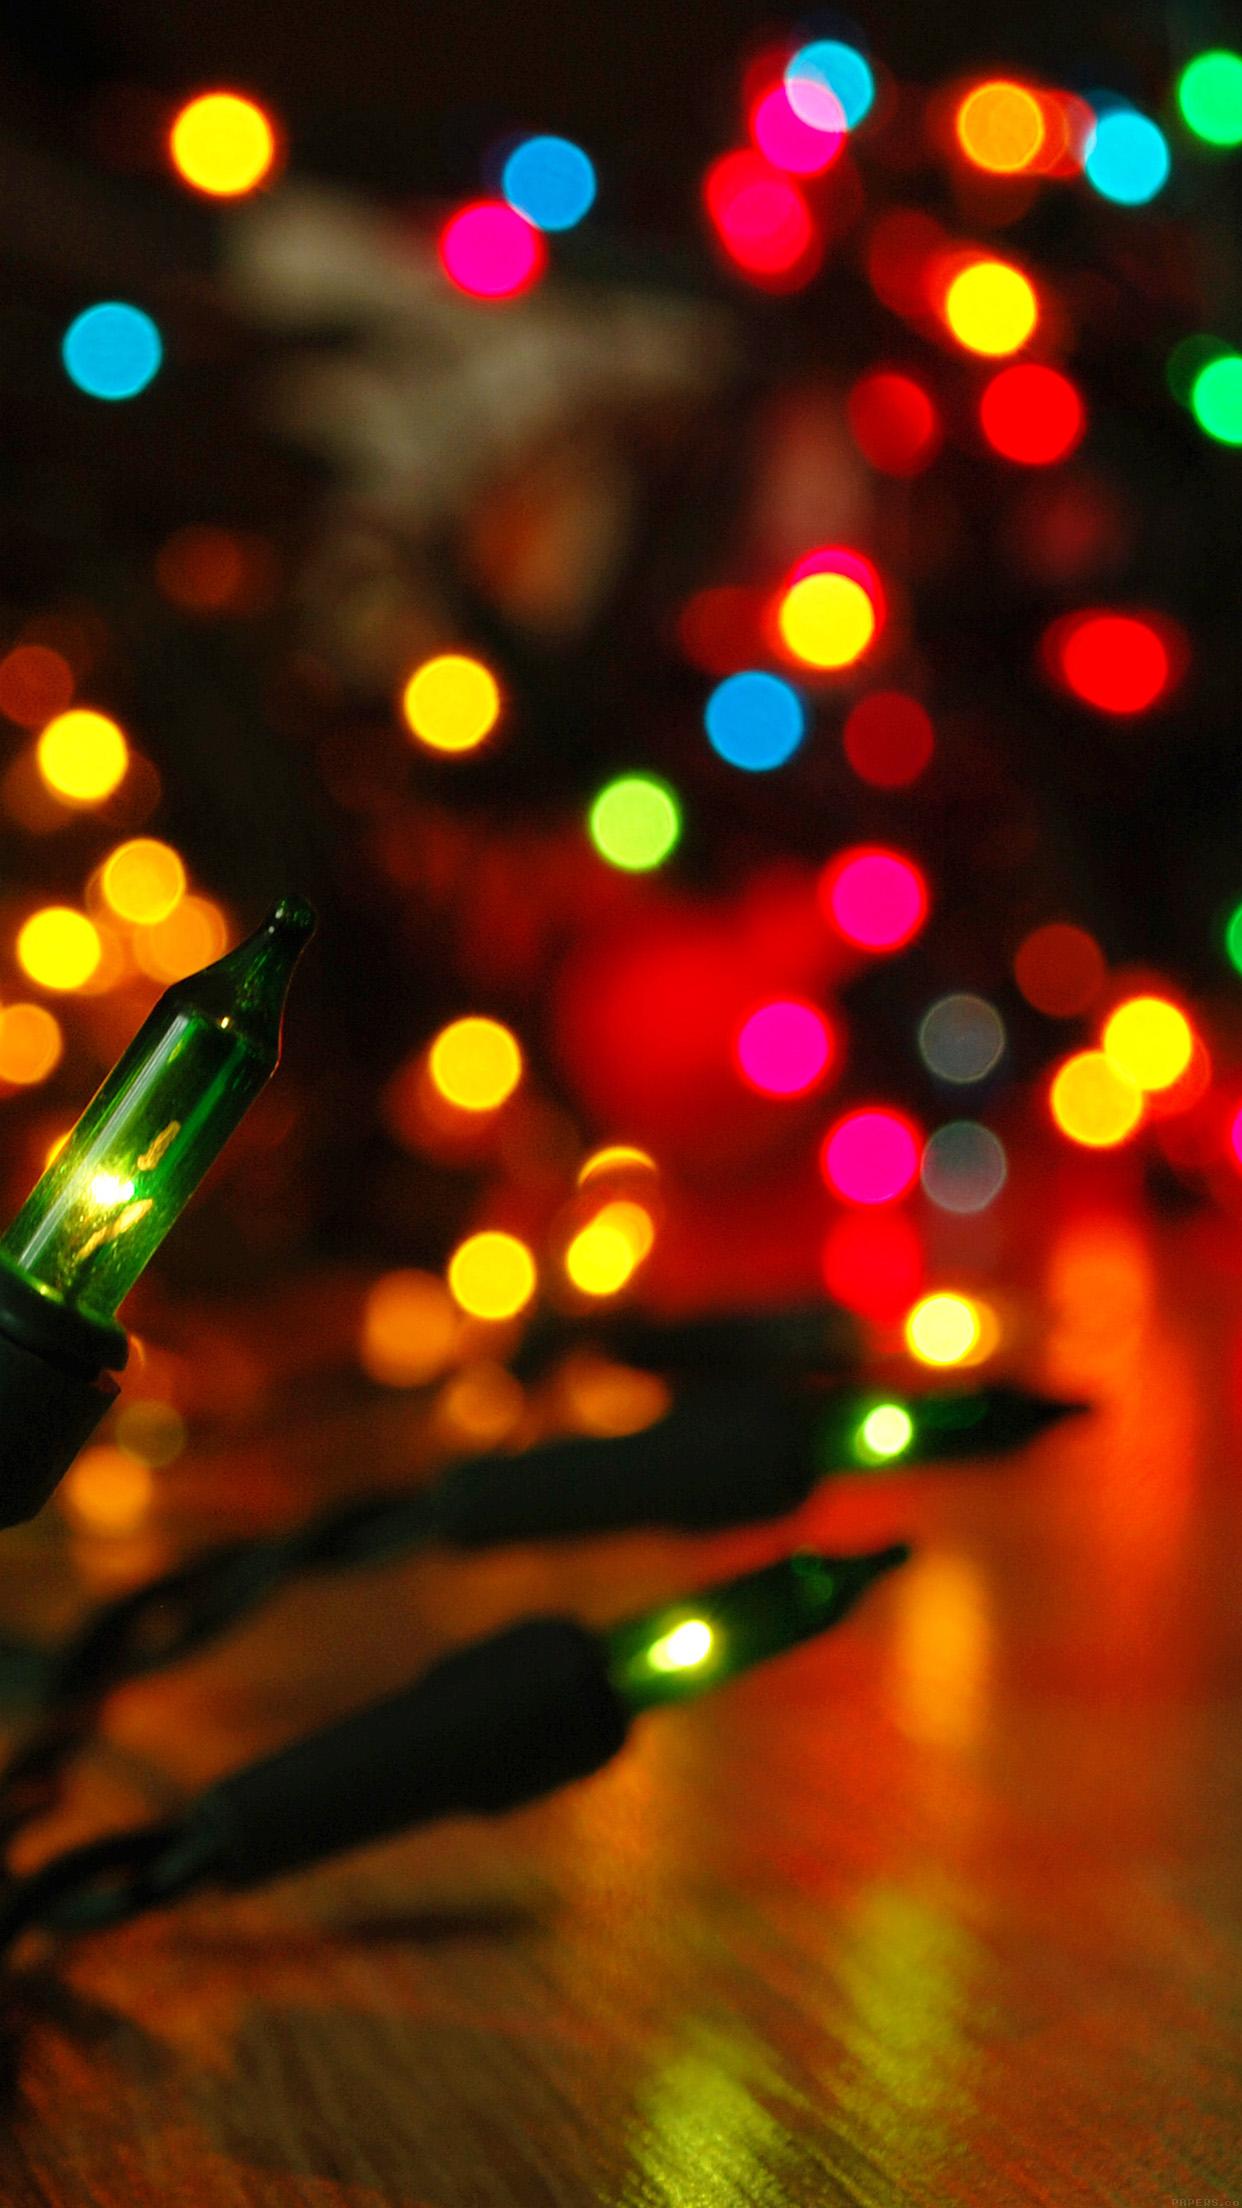 holiday background images free